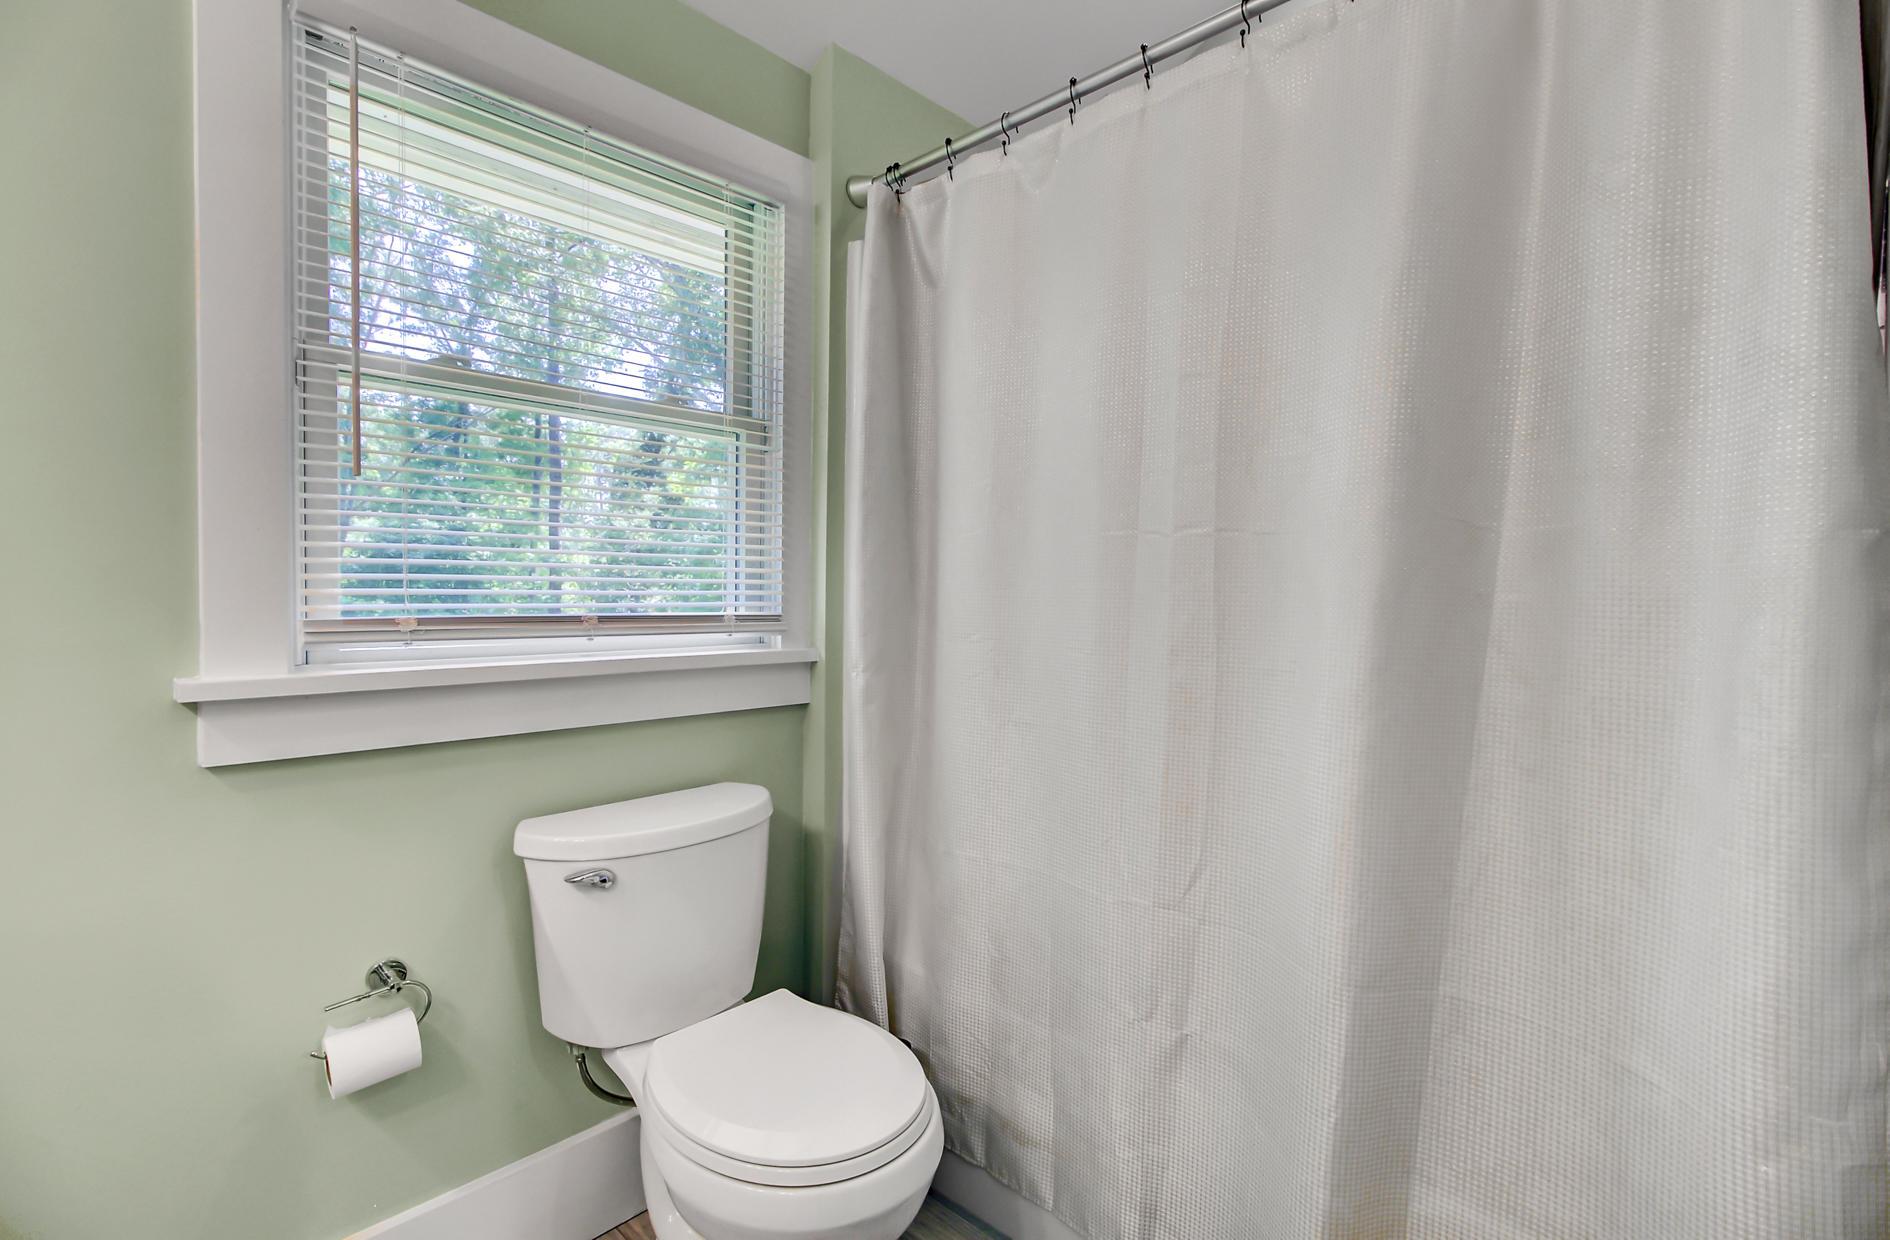 Yaugh Hall Homes For Sale - 1229 Porchers Bluff, Mount Pleasant, SC - 30